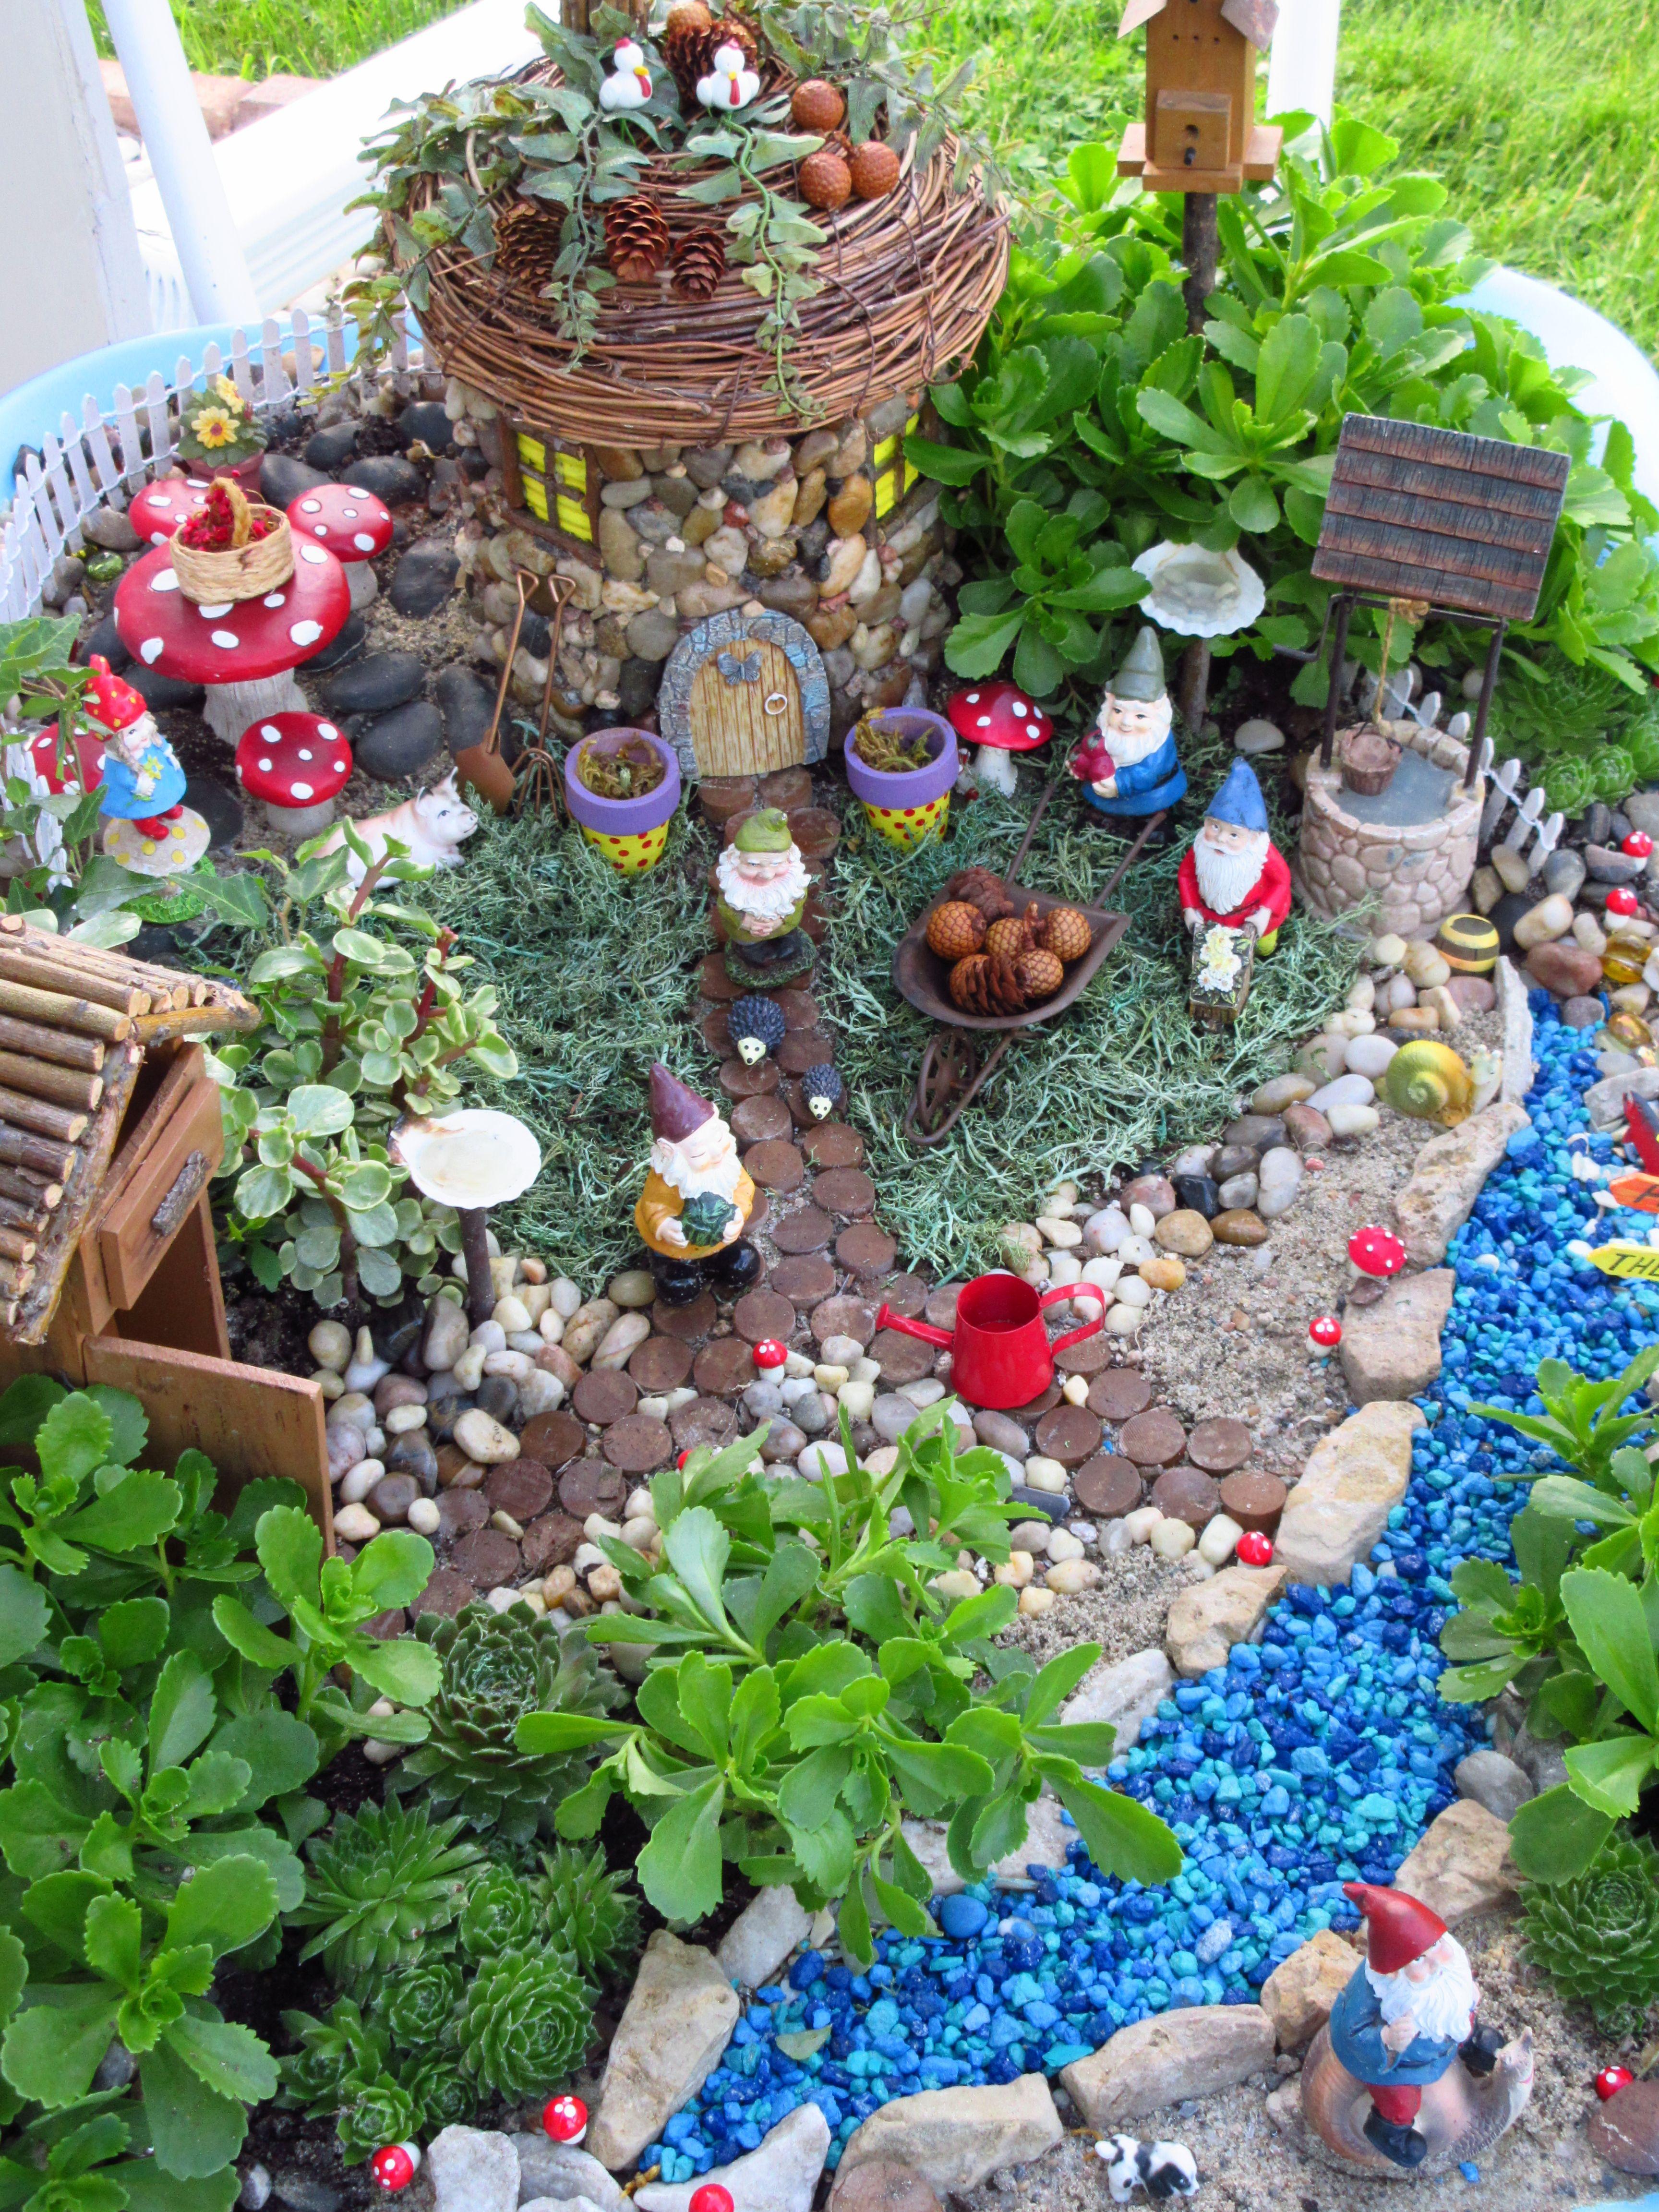 Favorite Garden Miniature Gnome Garden Ideas Diy Fairy Gnome Fairy Container Garden Miniature Fairy Mini Gardentea Pin By Jazzy Davis On Faerie Pinterest Gardens garden Miniature Gnome Garden Ideas